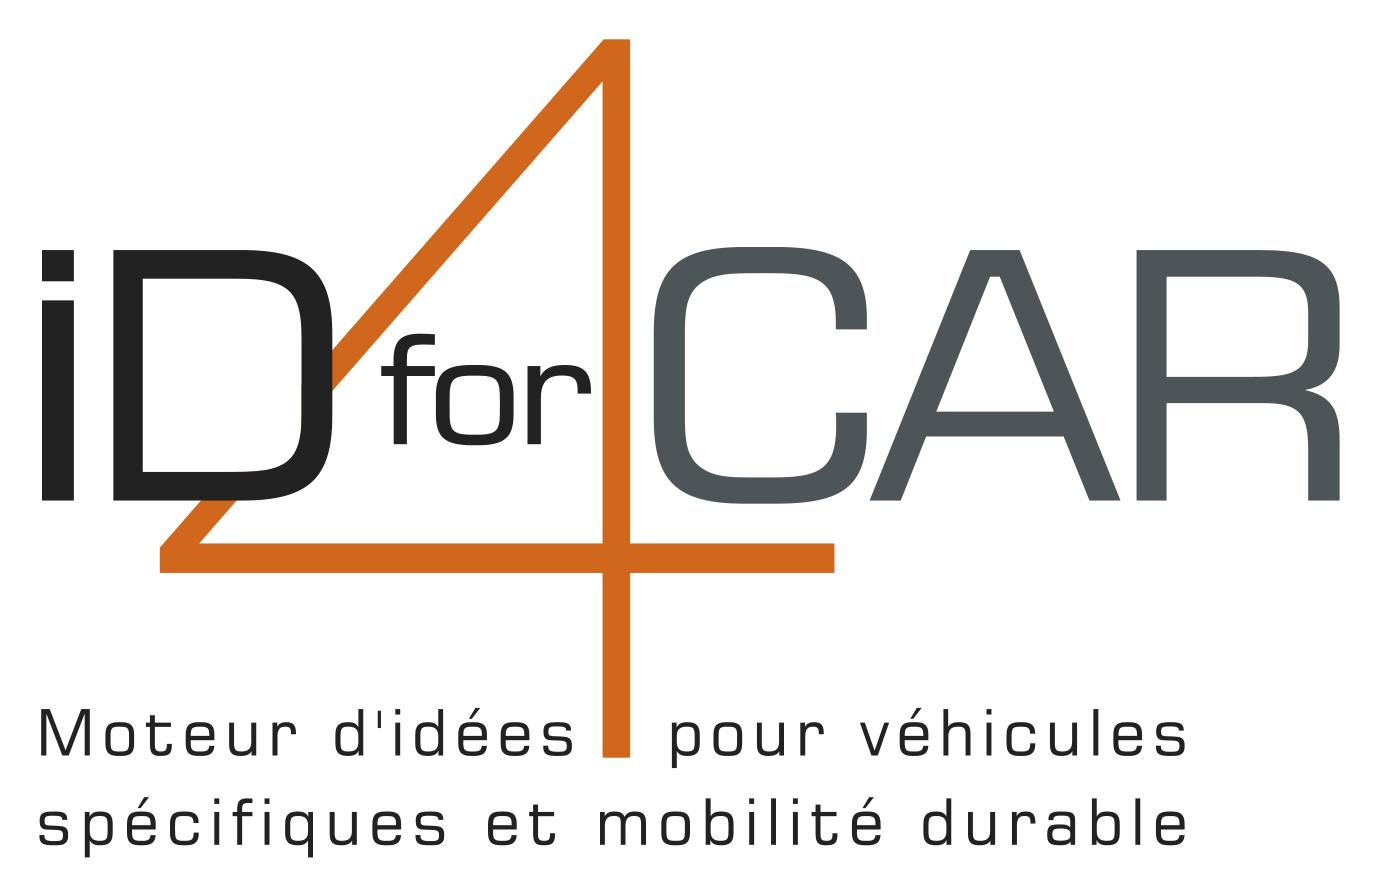 Le Flash Agenda d'ID4CAR